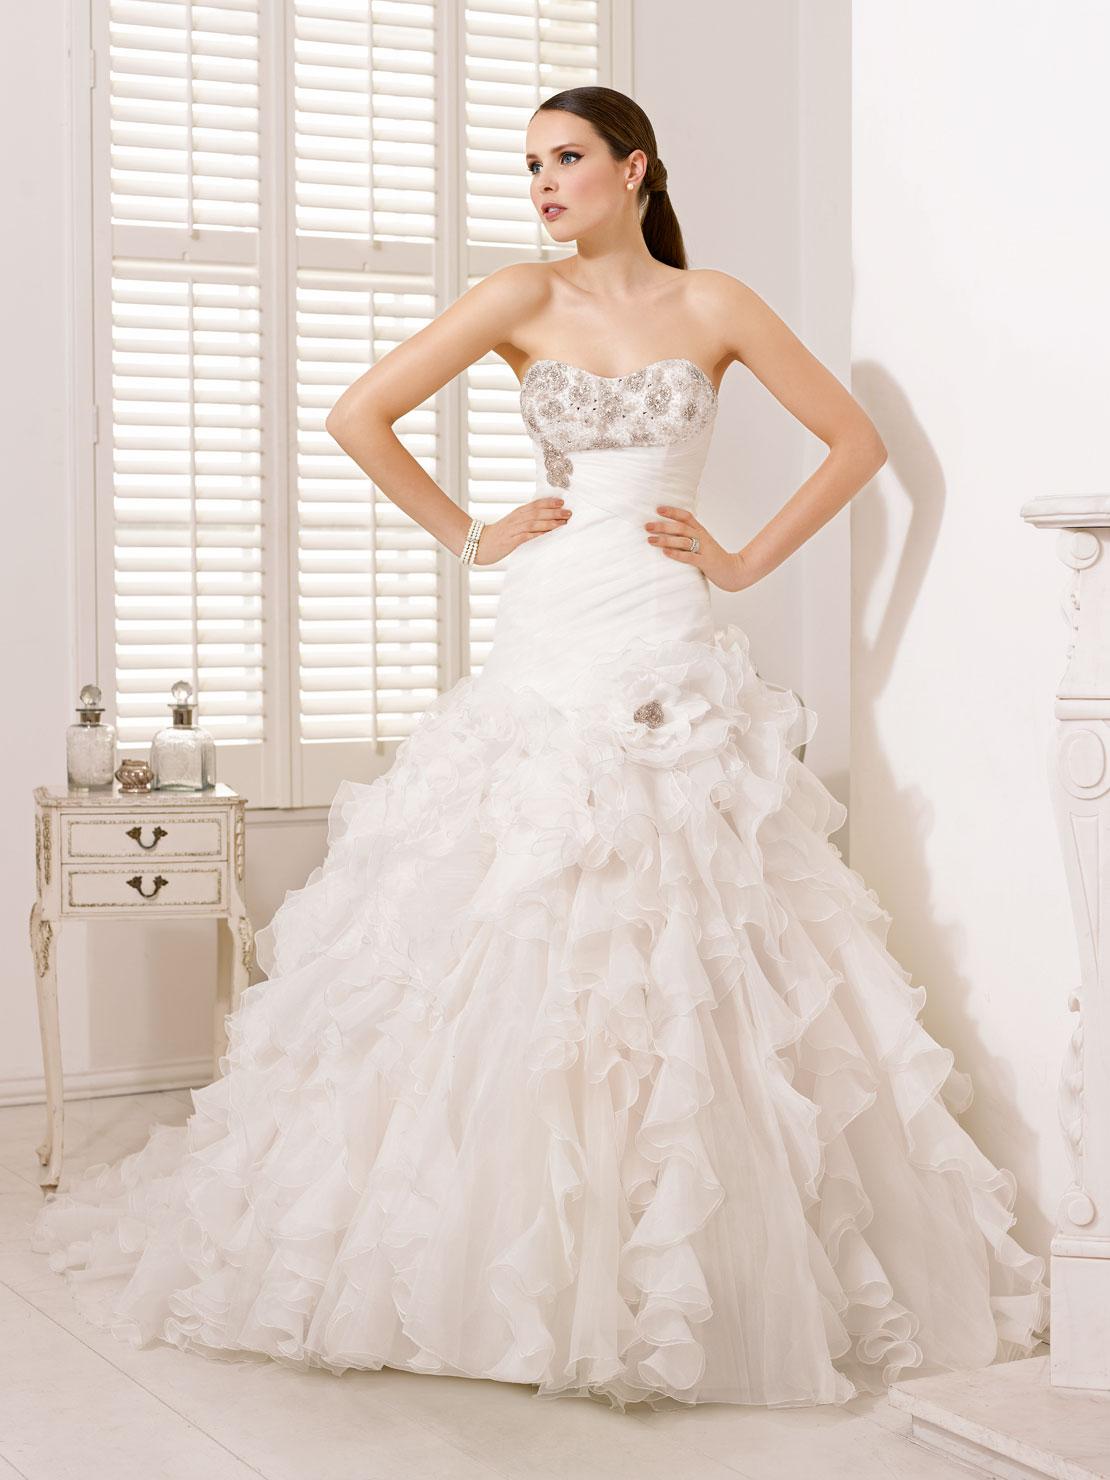 GALLERY: Dress Skirt Types